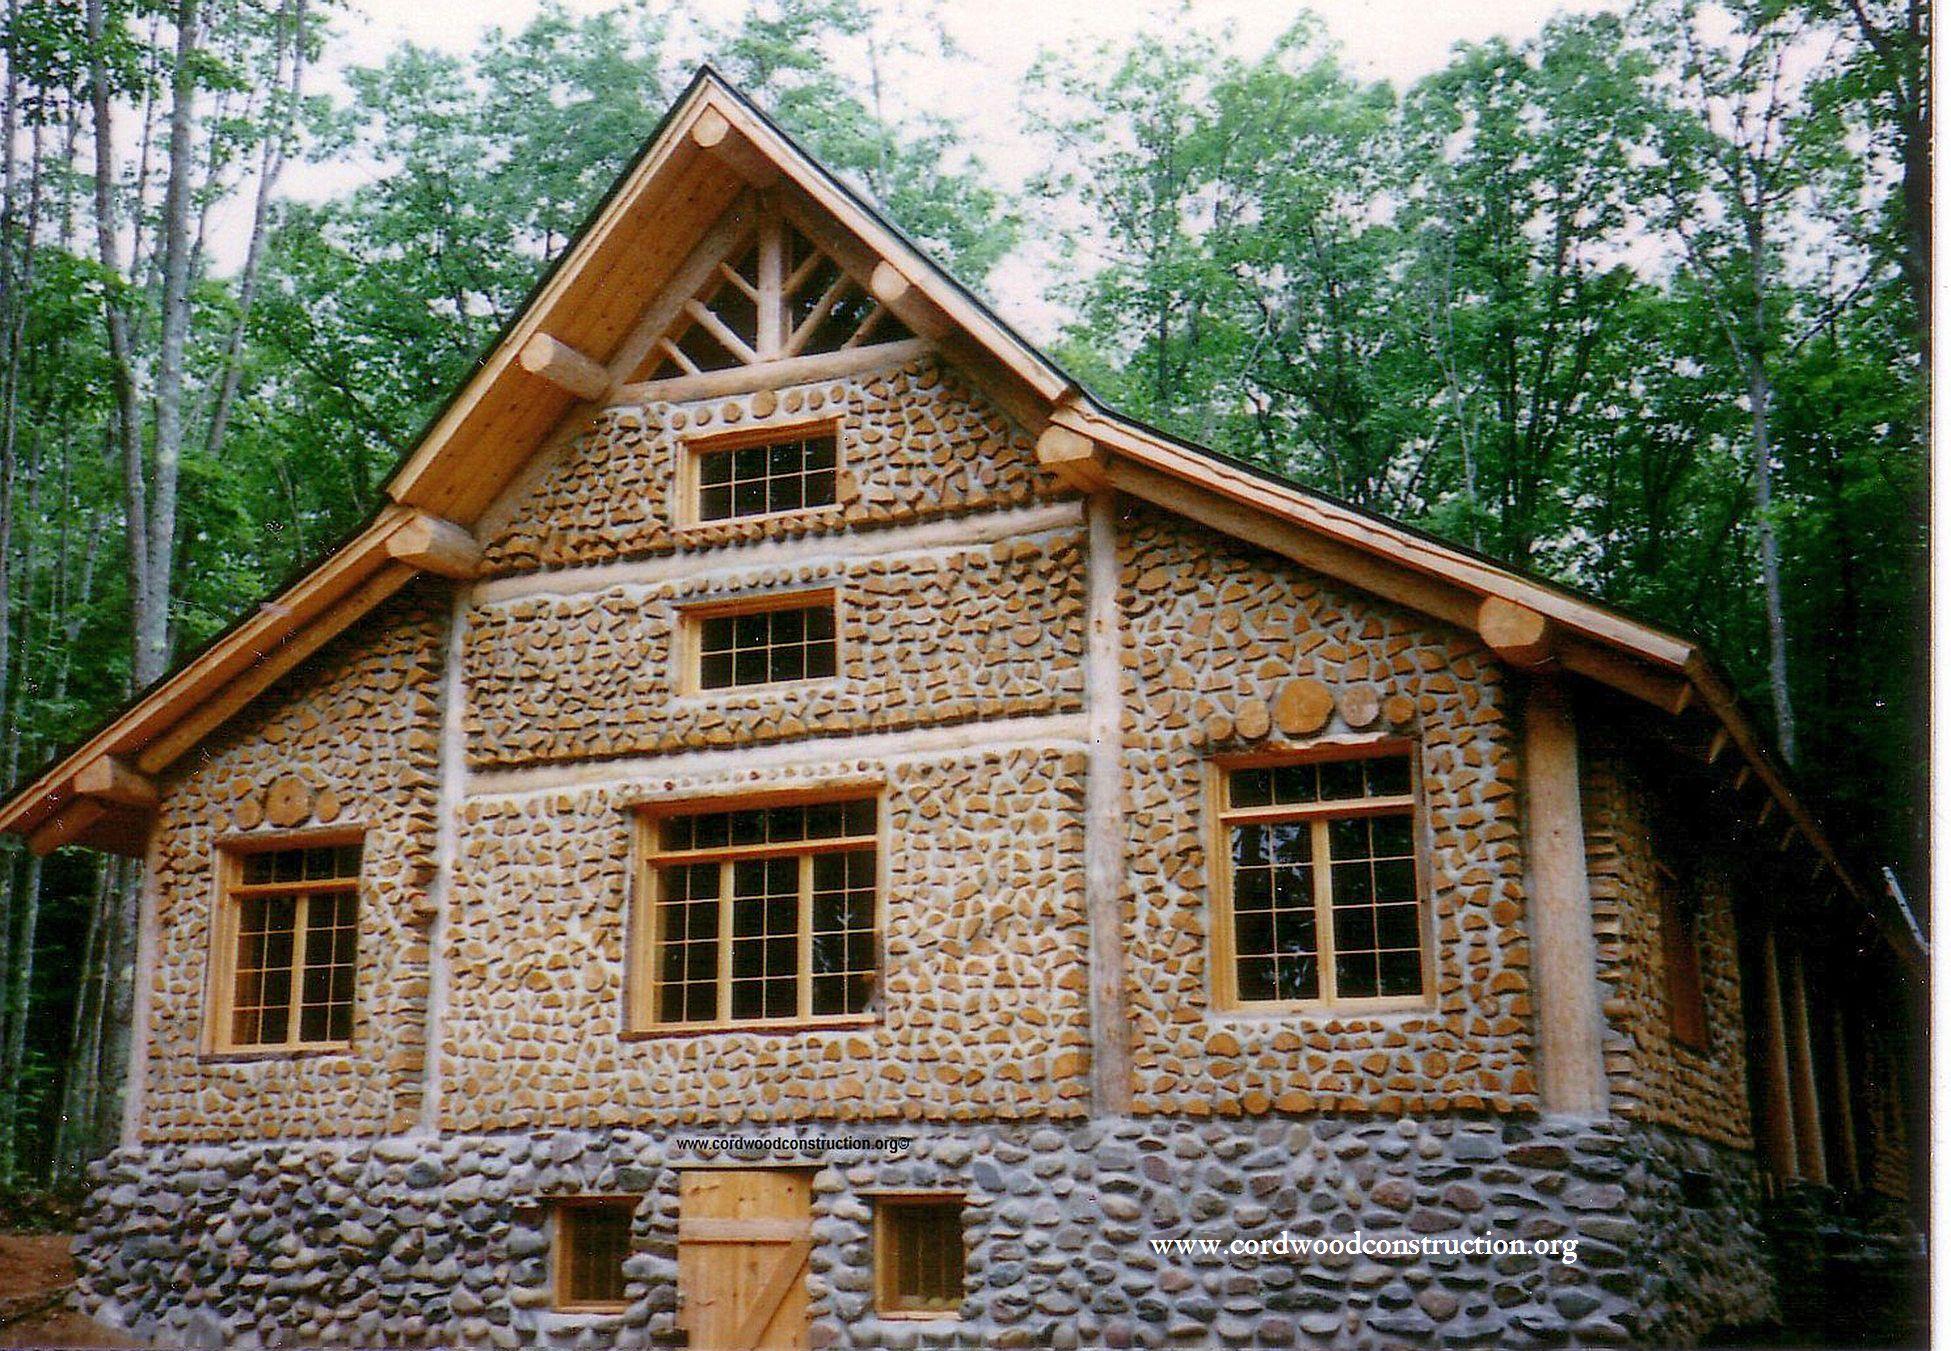 Cordwood_Lodge_northern_Wisconsin_photo_by_Richard_Flatau_300ppi small pixels